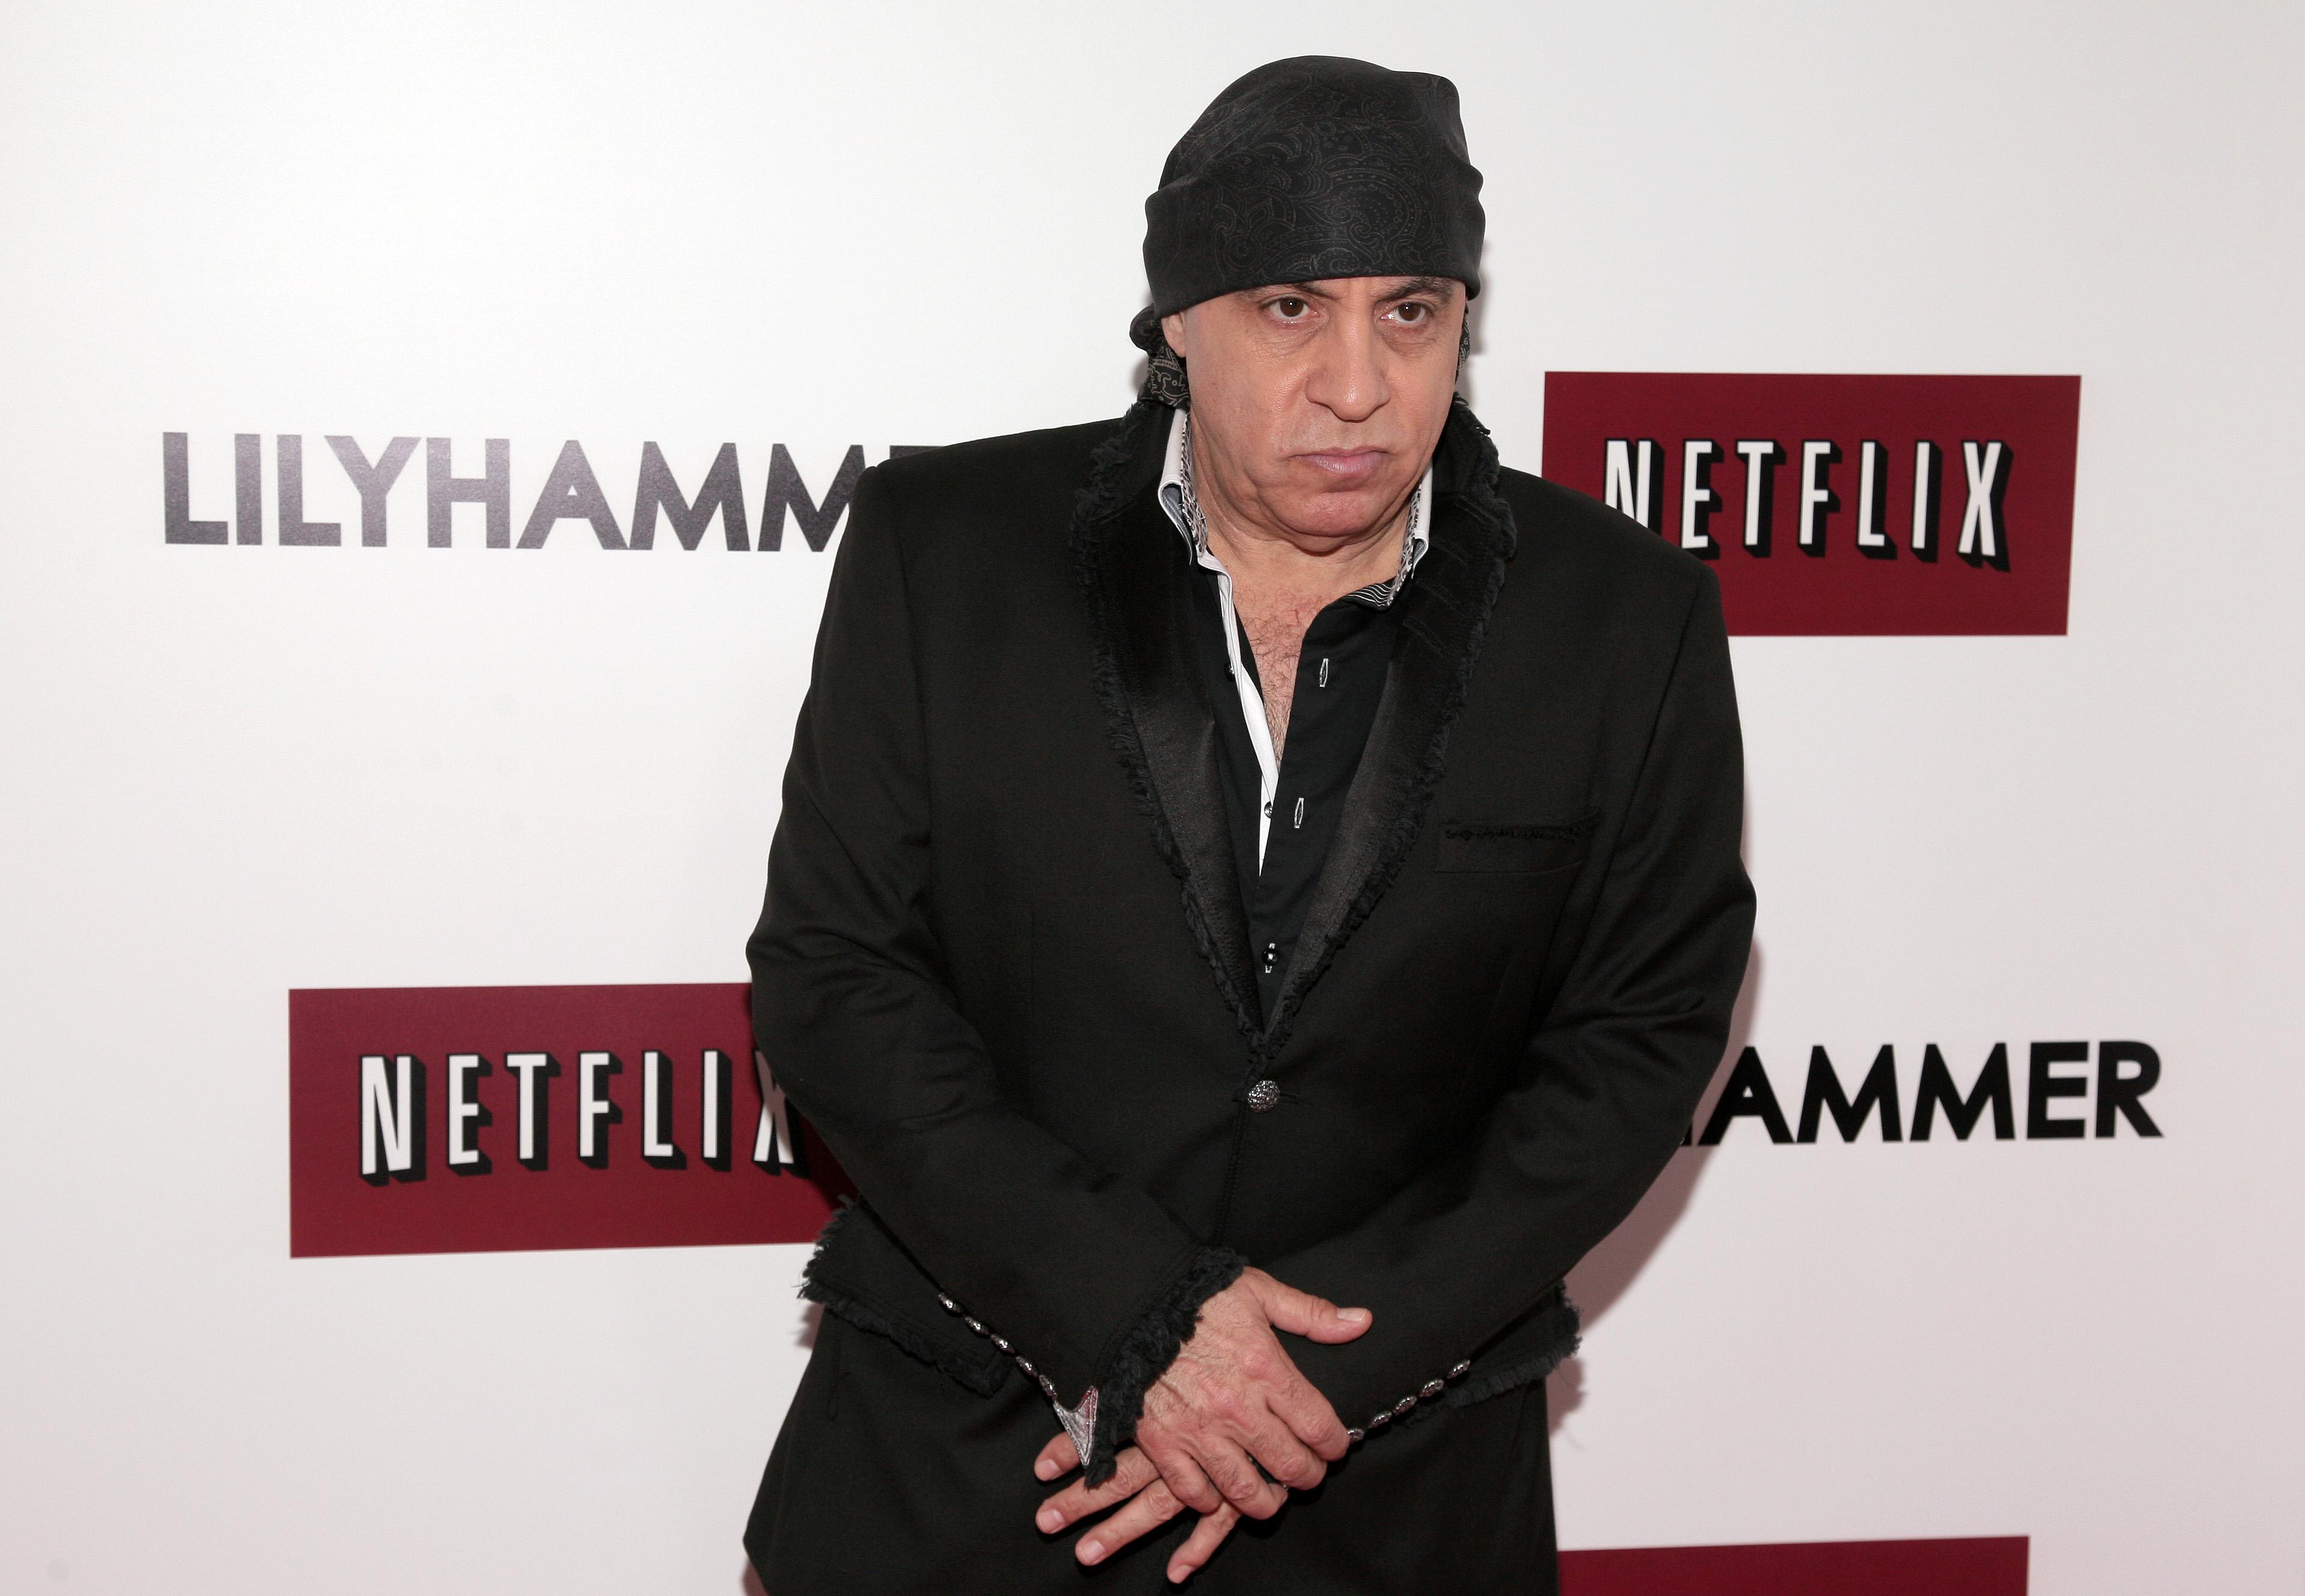 Netflix cancels Van Zandt's 'Lilyhammer' after three seasons